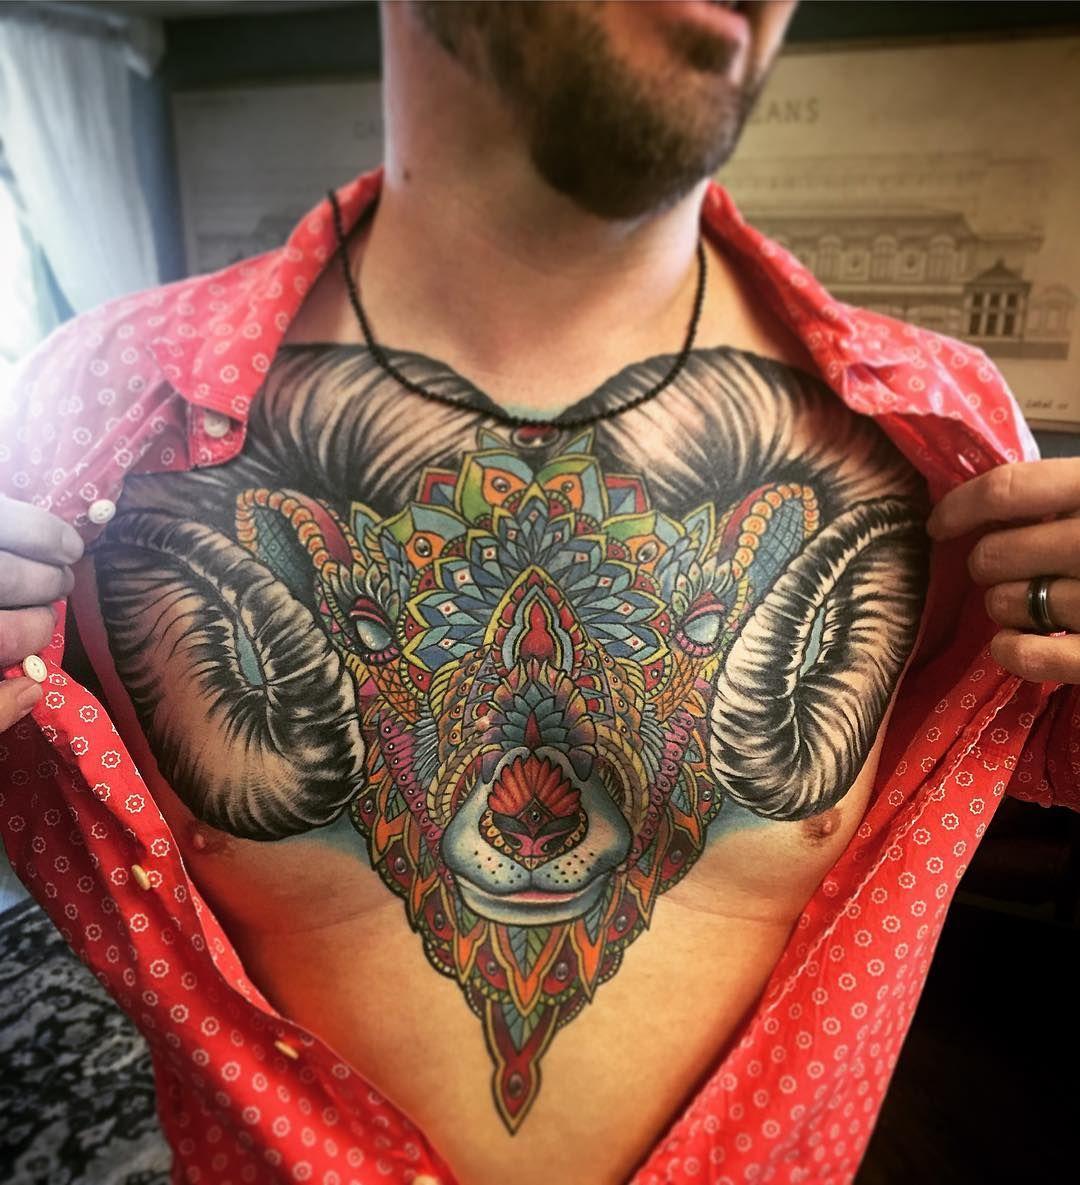 Love The Style Of This Tattoo Tattoo S Tatowierungen Tattoo